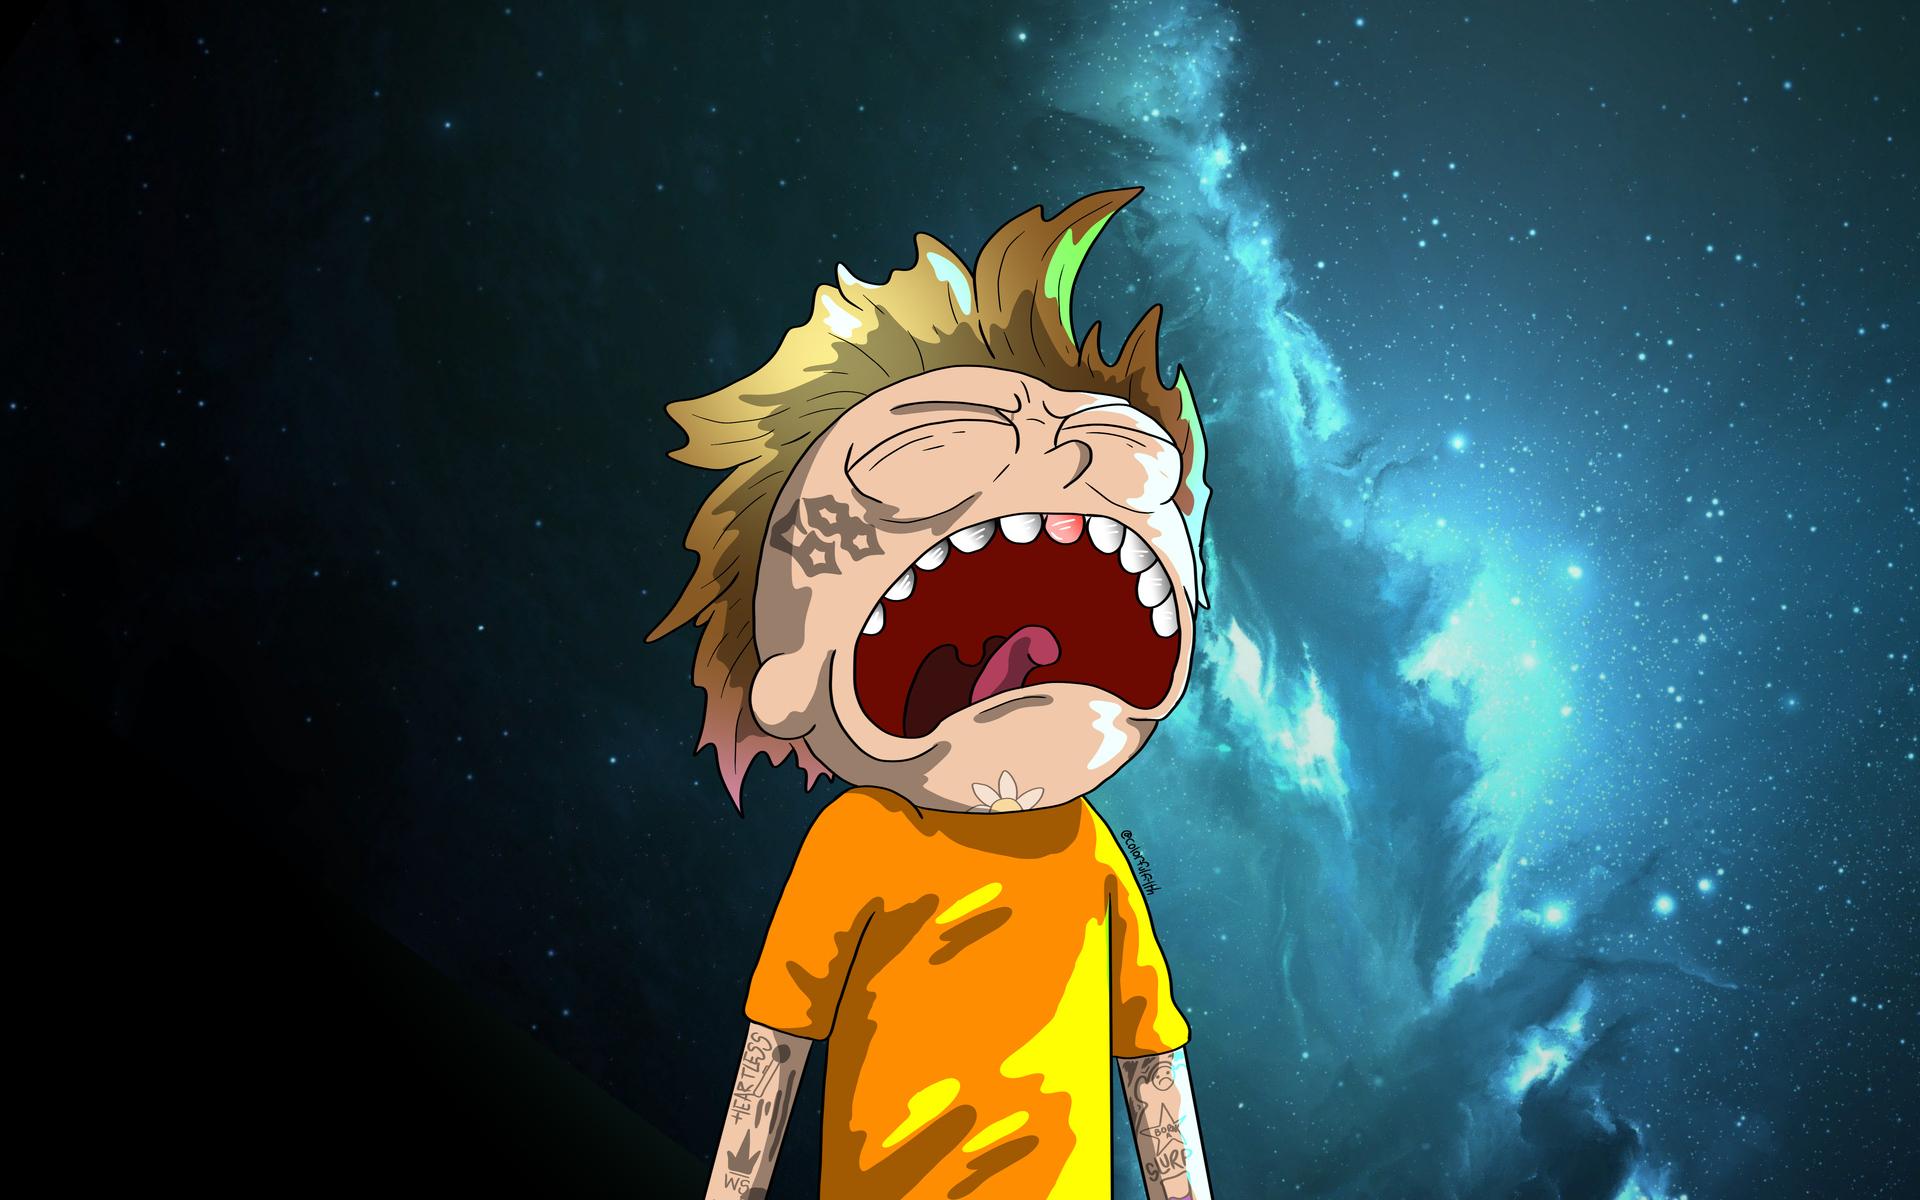 crying-morty-digital-art-bg.jpg